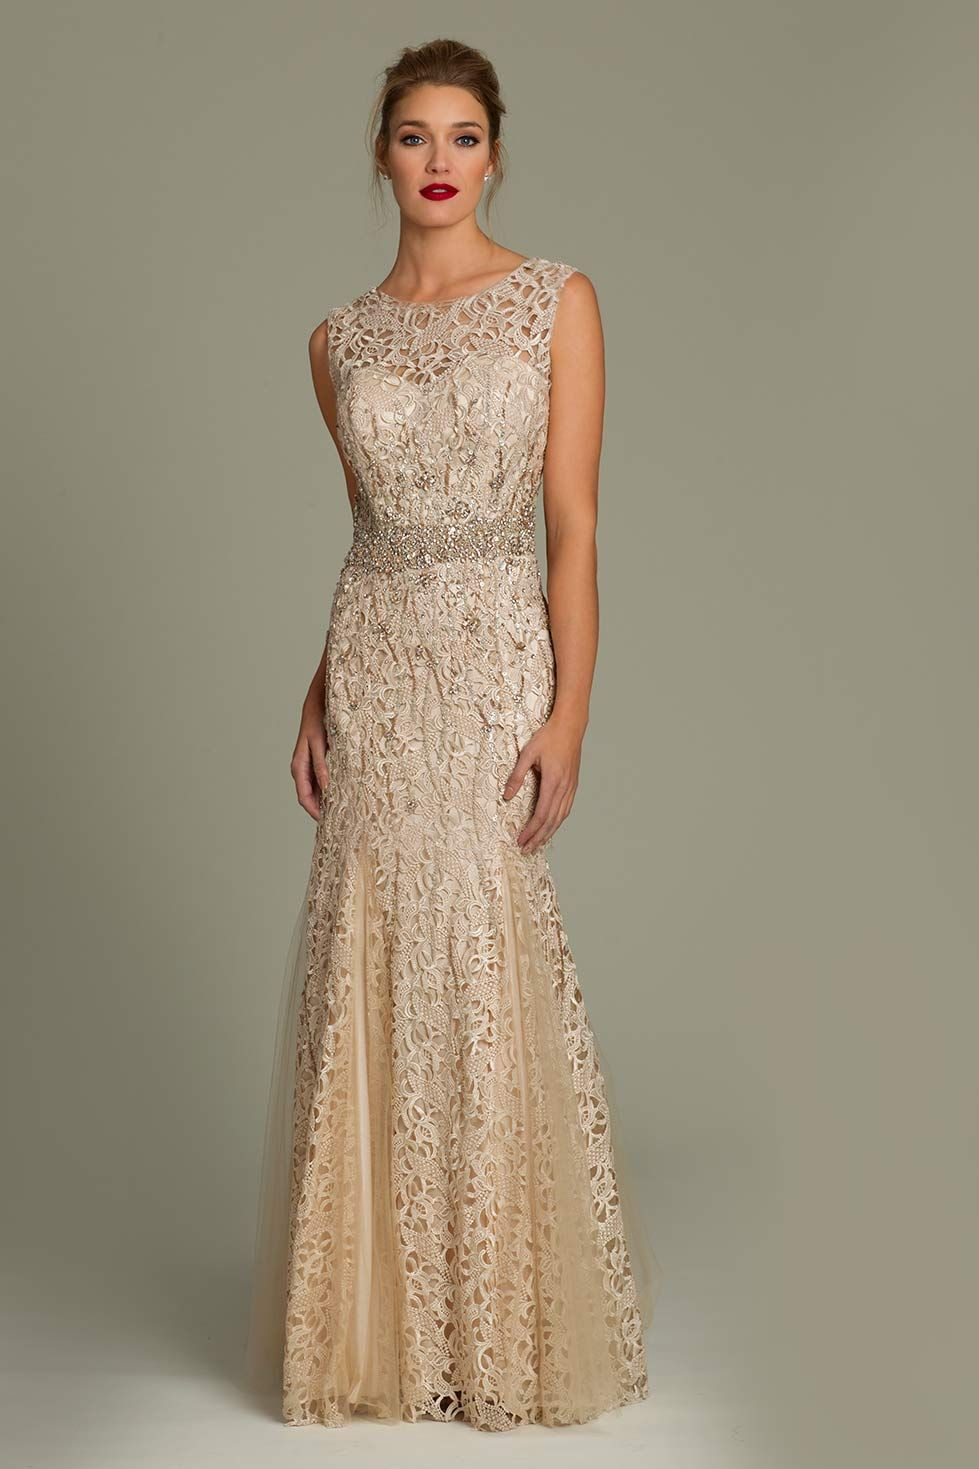 California wedding ideas uc pinterest flapper style dresses